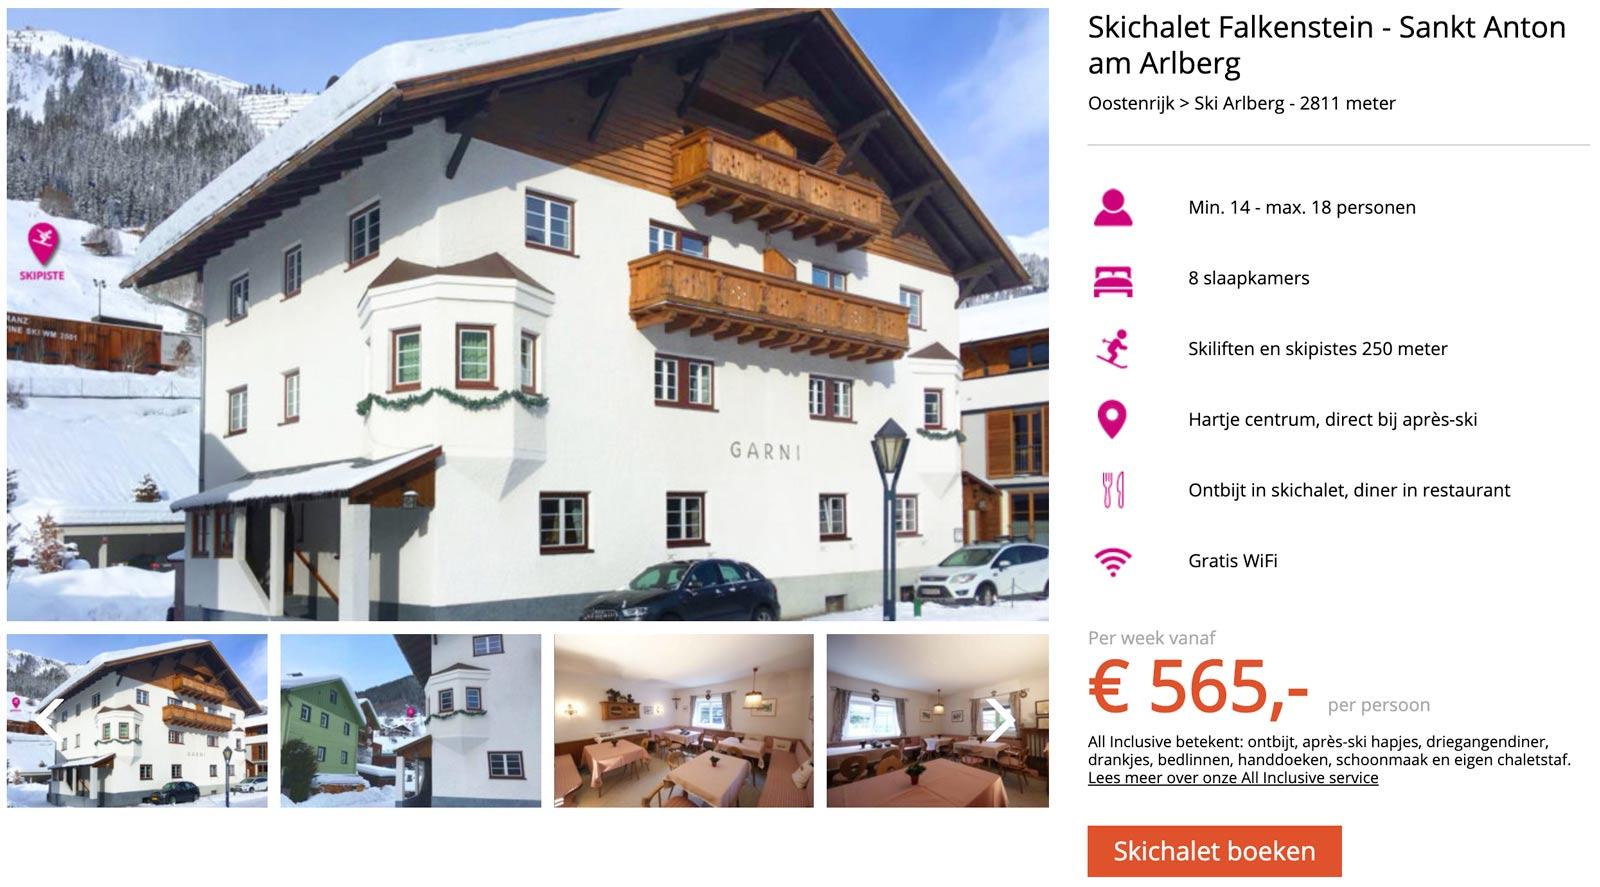 Chalet in St. Anton am Arlberg